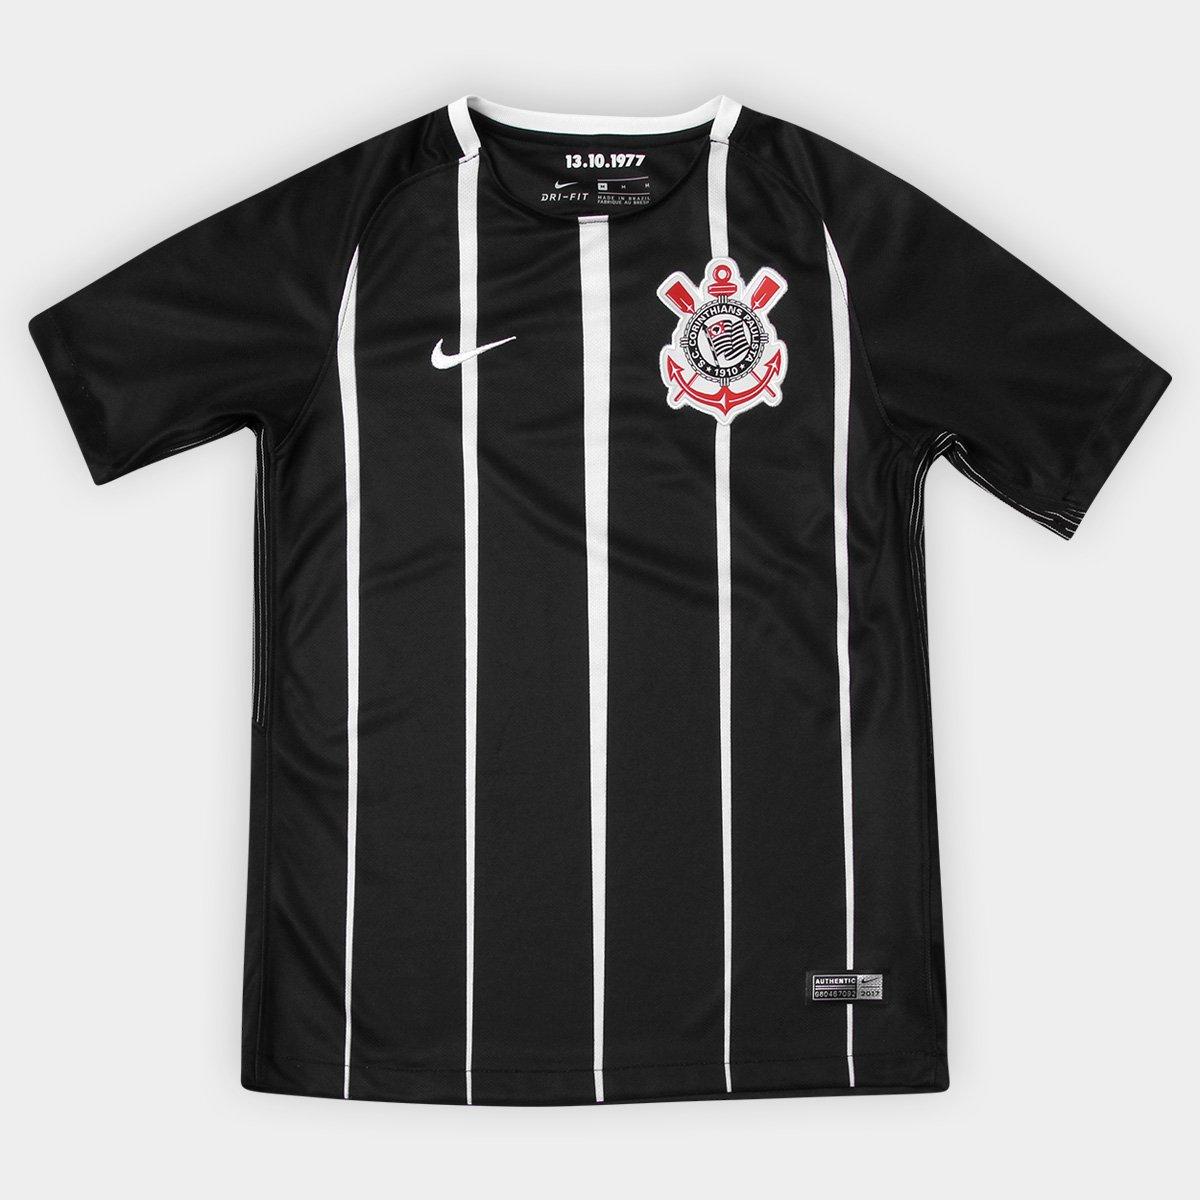 e36632495 Camisa Corinthians Juvenil II 17 18 s nº Torcedor Nike - Compre Agora